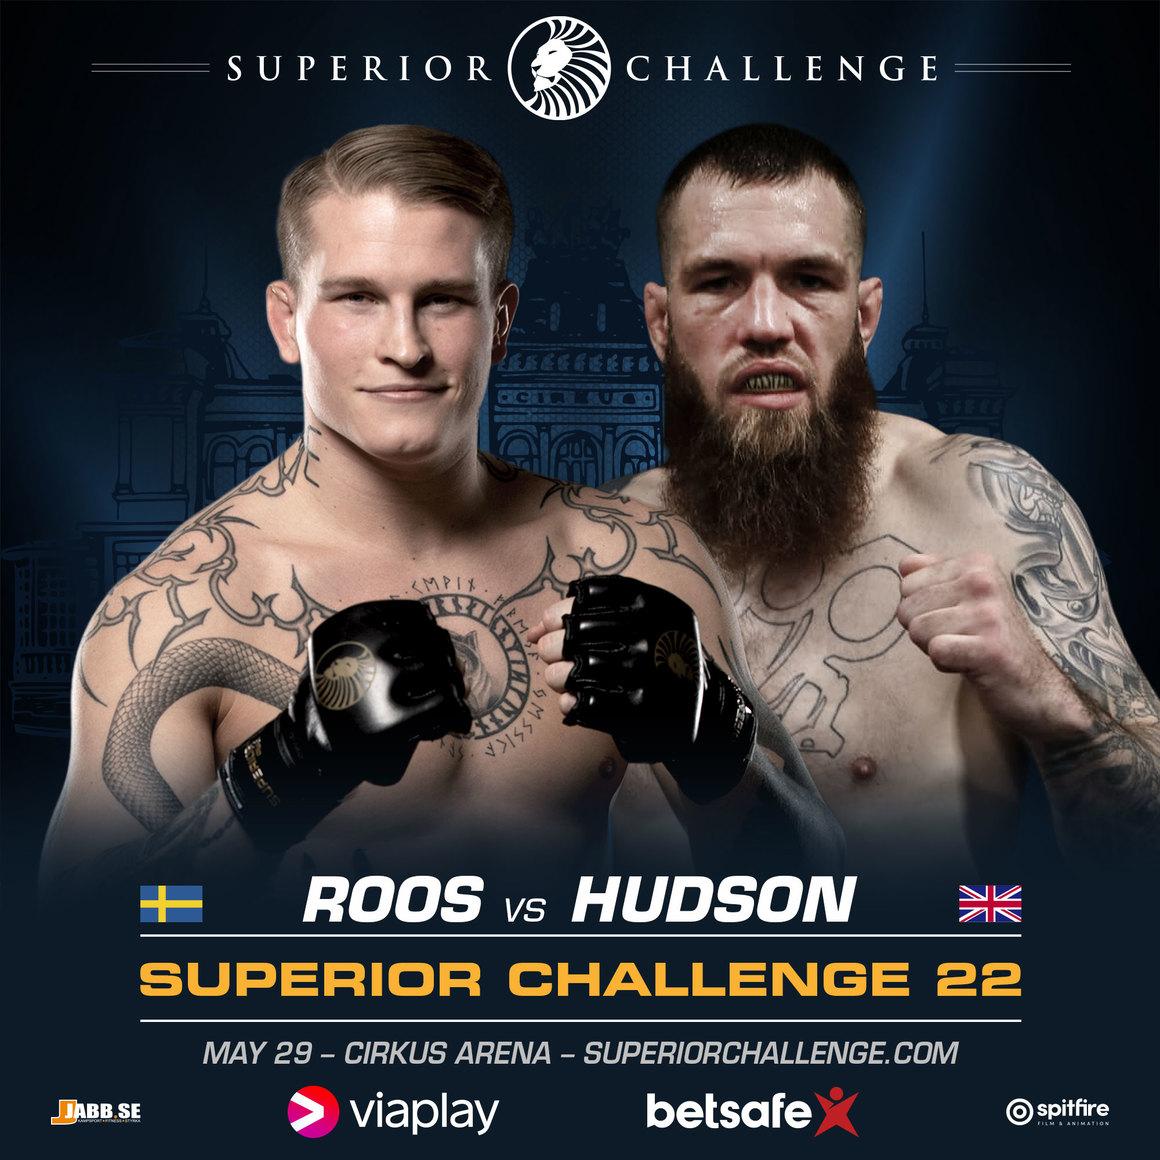 Superior Challenge 22: Taggad Roos möter Bellator-veteran